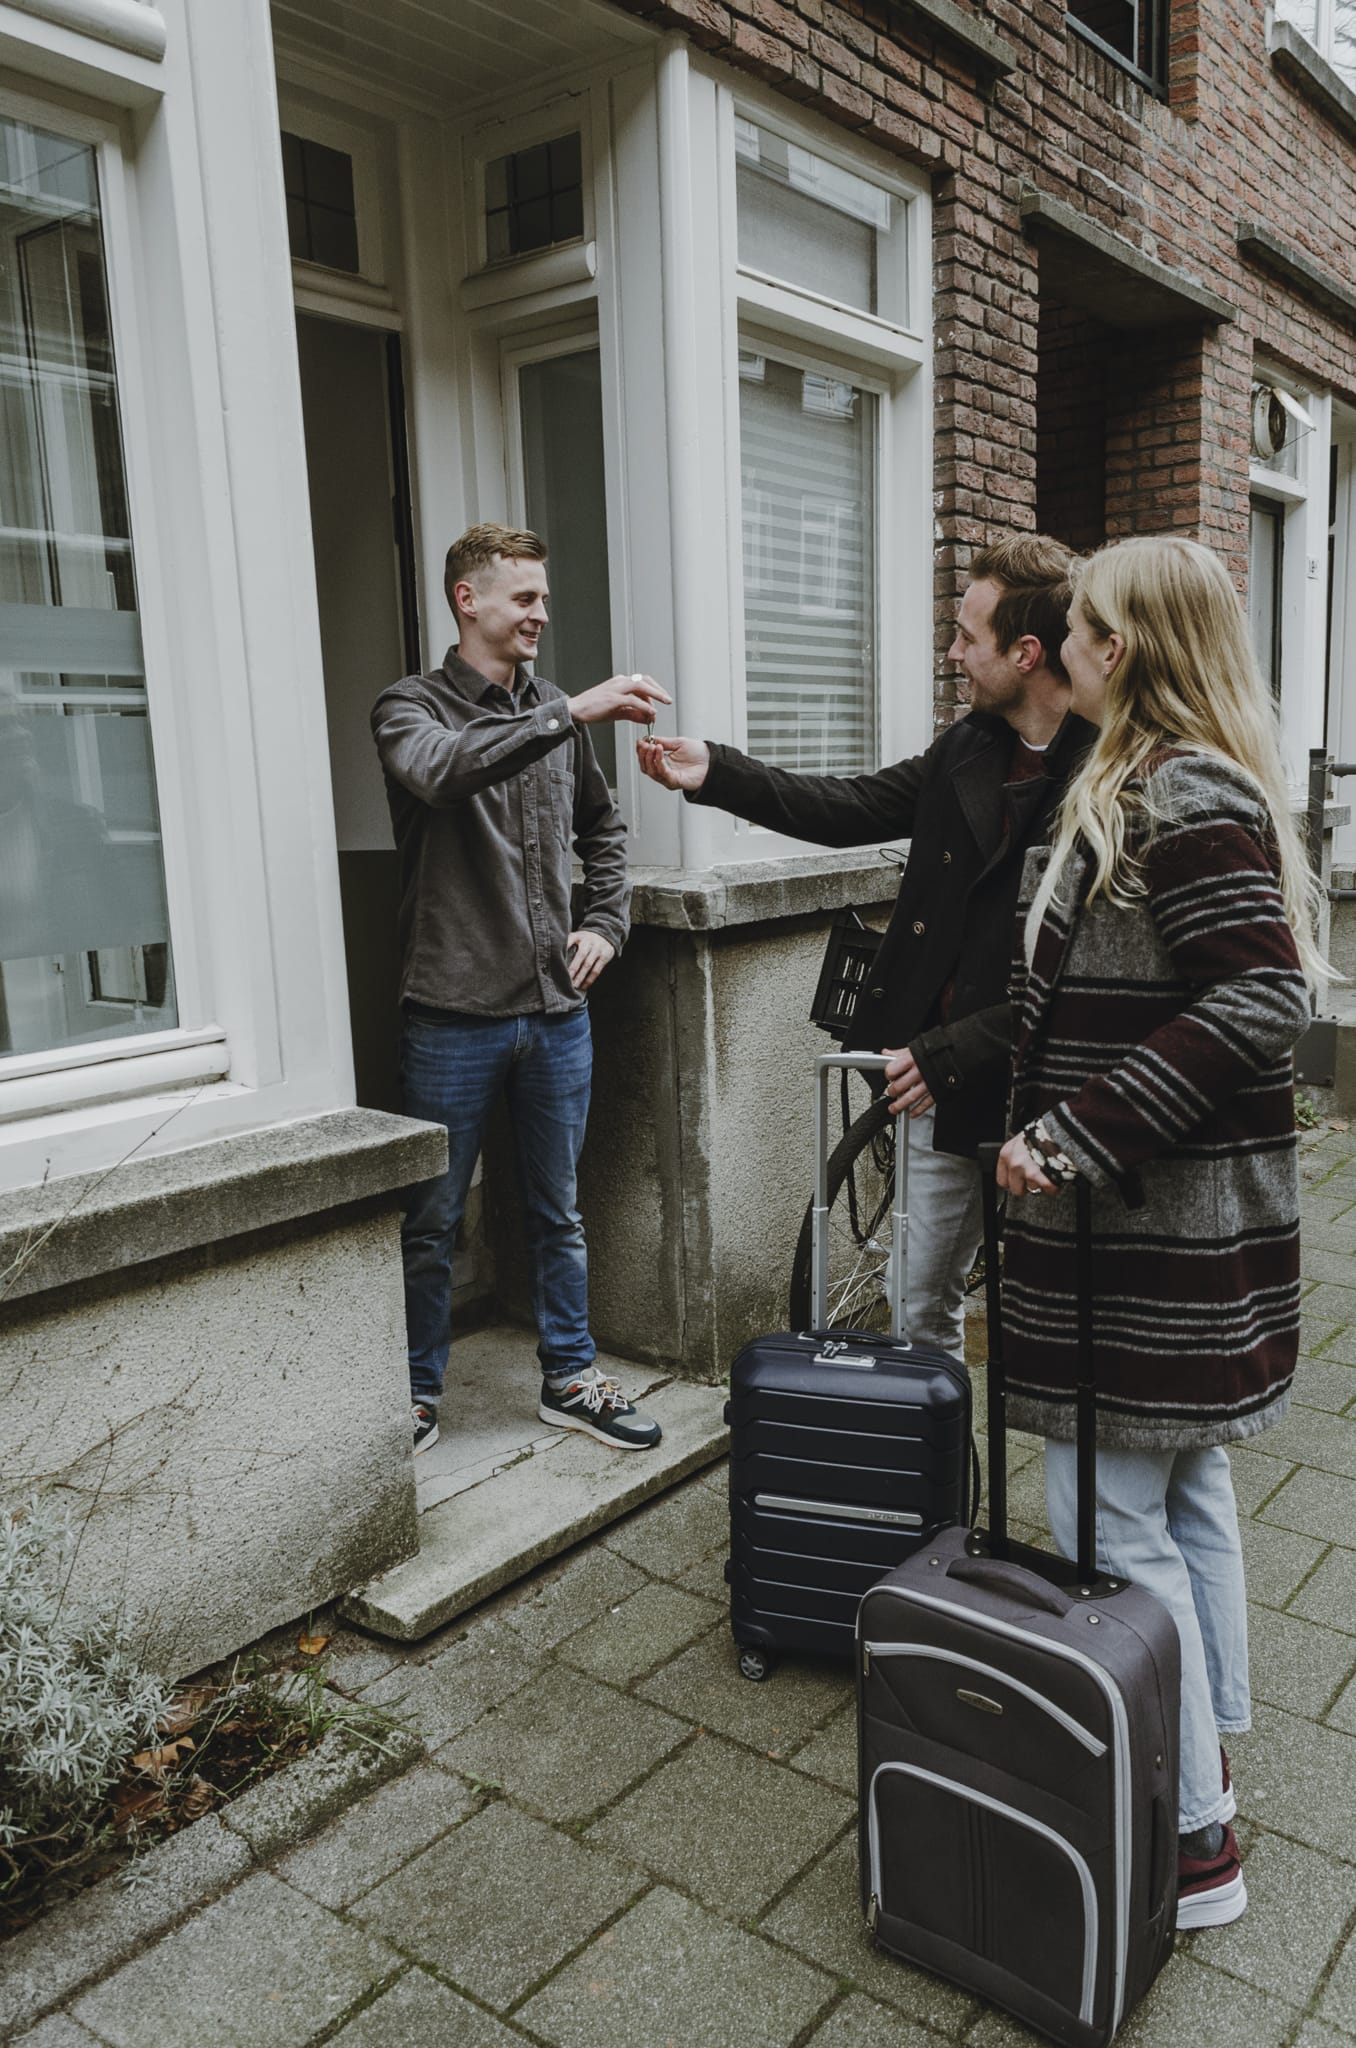 Verhuur makkelijk je woning als short stay Rotterdam